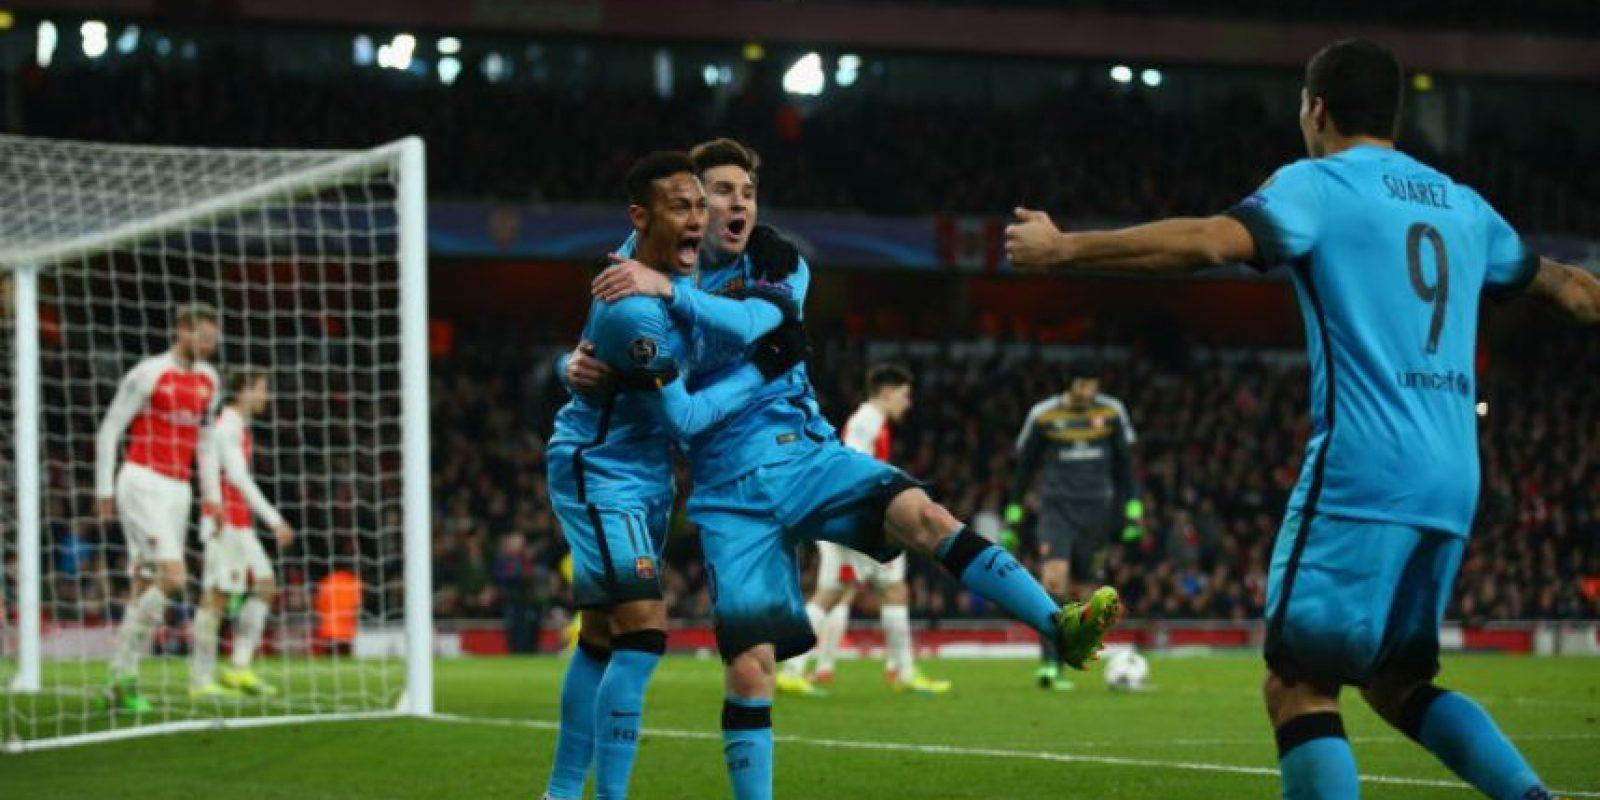 La MSN suma 58 goles solo en la Liga de España Foto:Getty Images